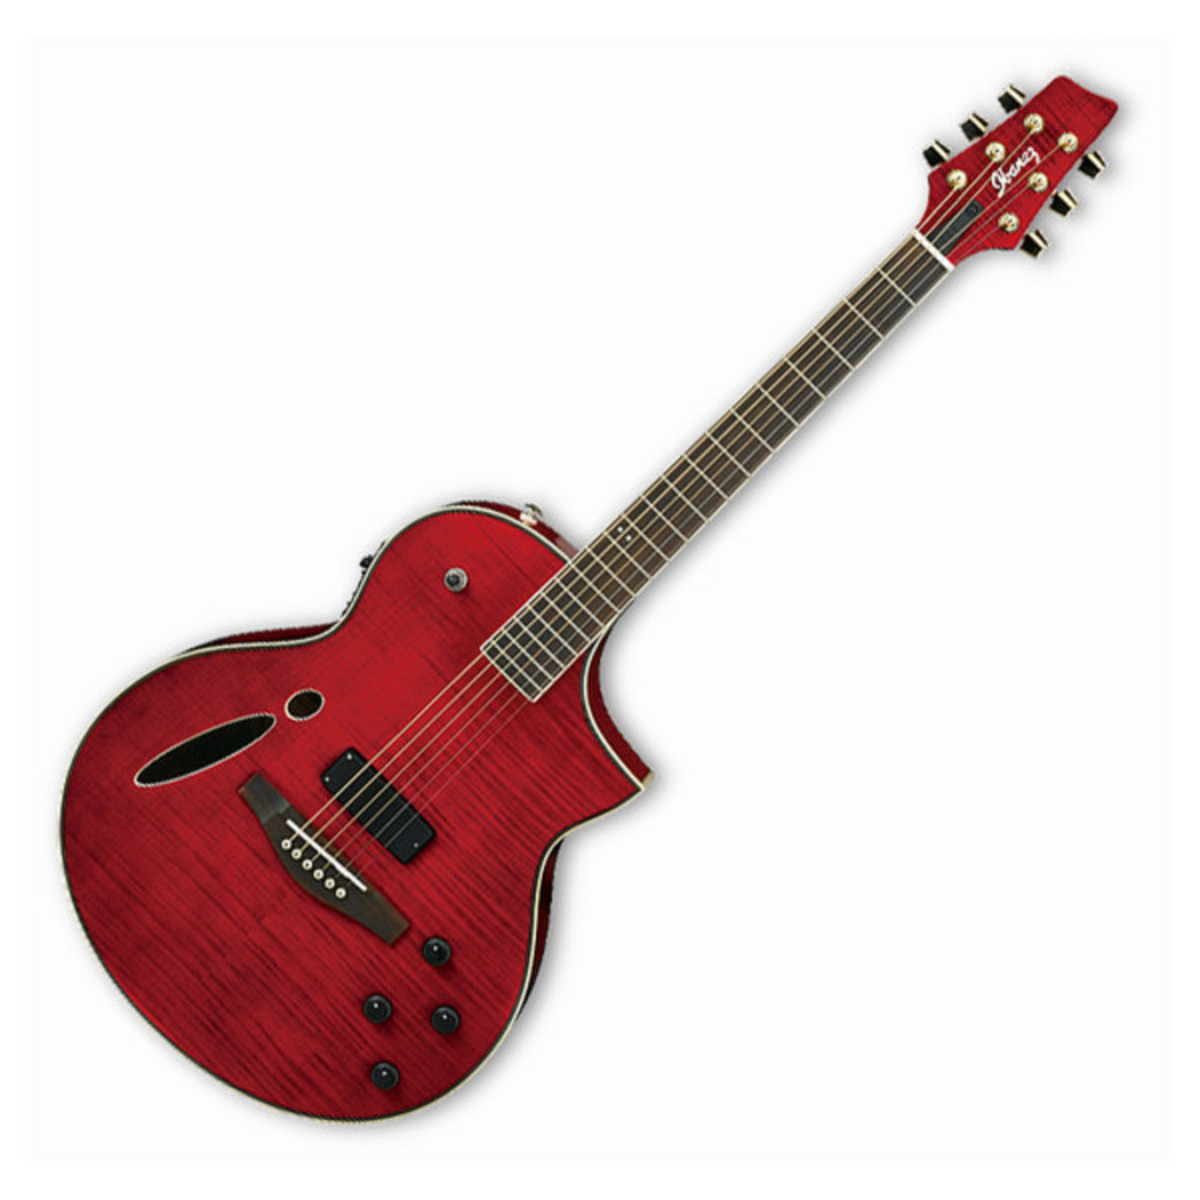 ibanez montage msc380fm guitare electro acoustique trf. Black Bedroom Furniture Sets. Home Design Ideas